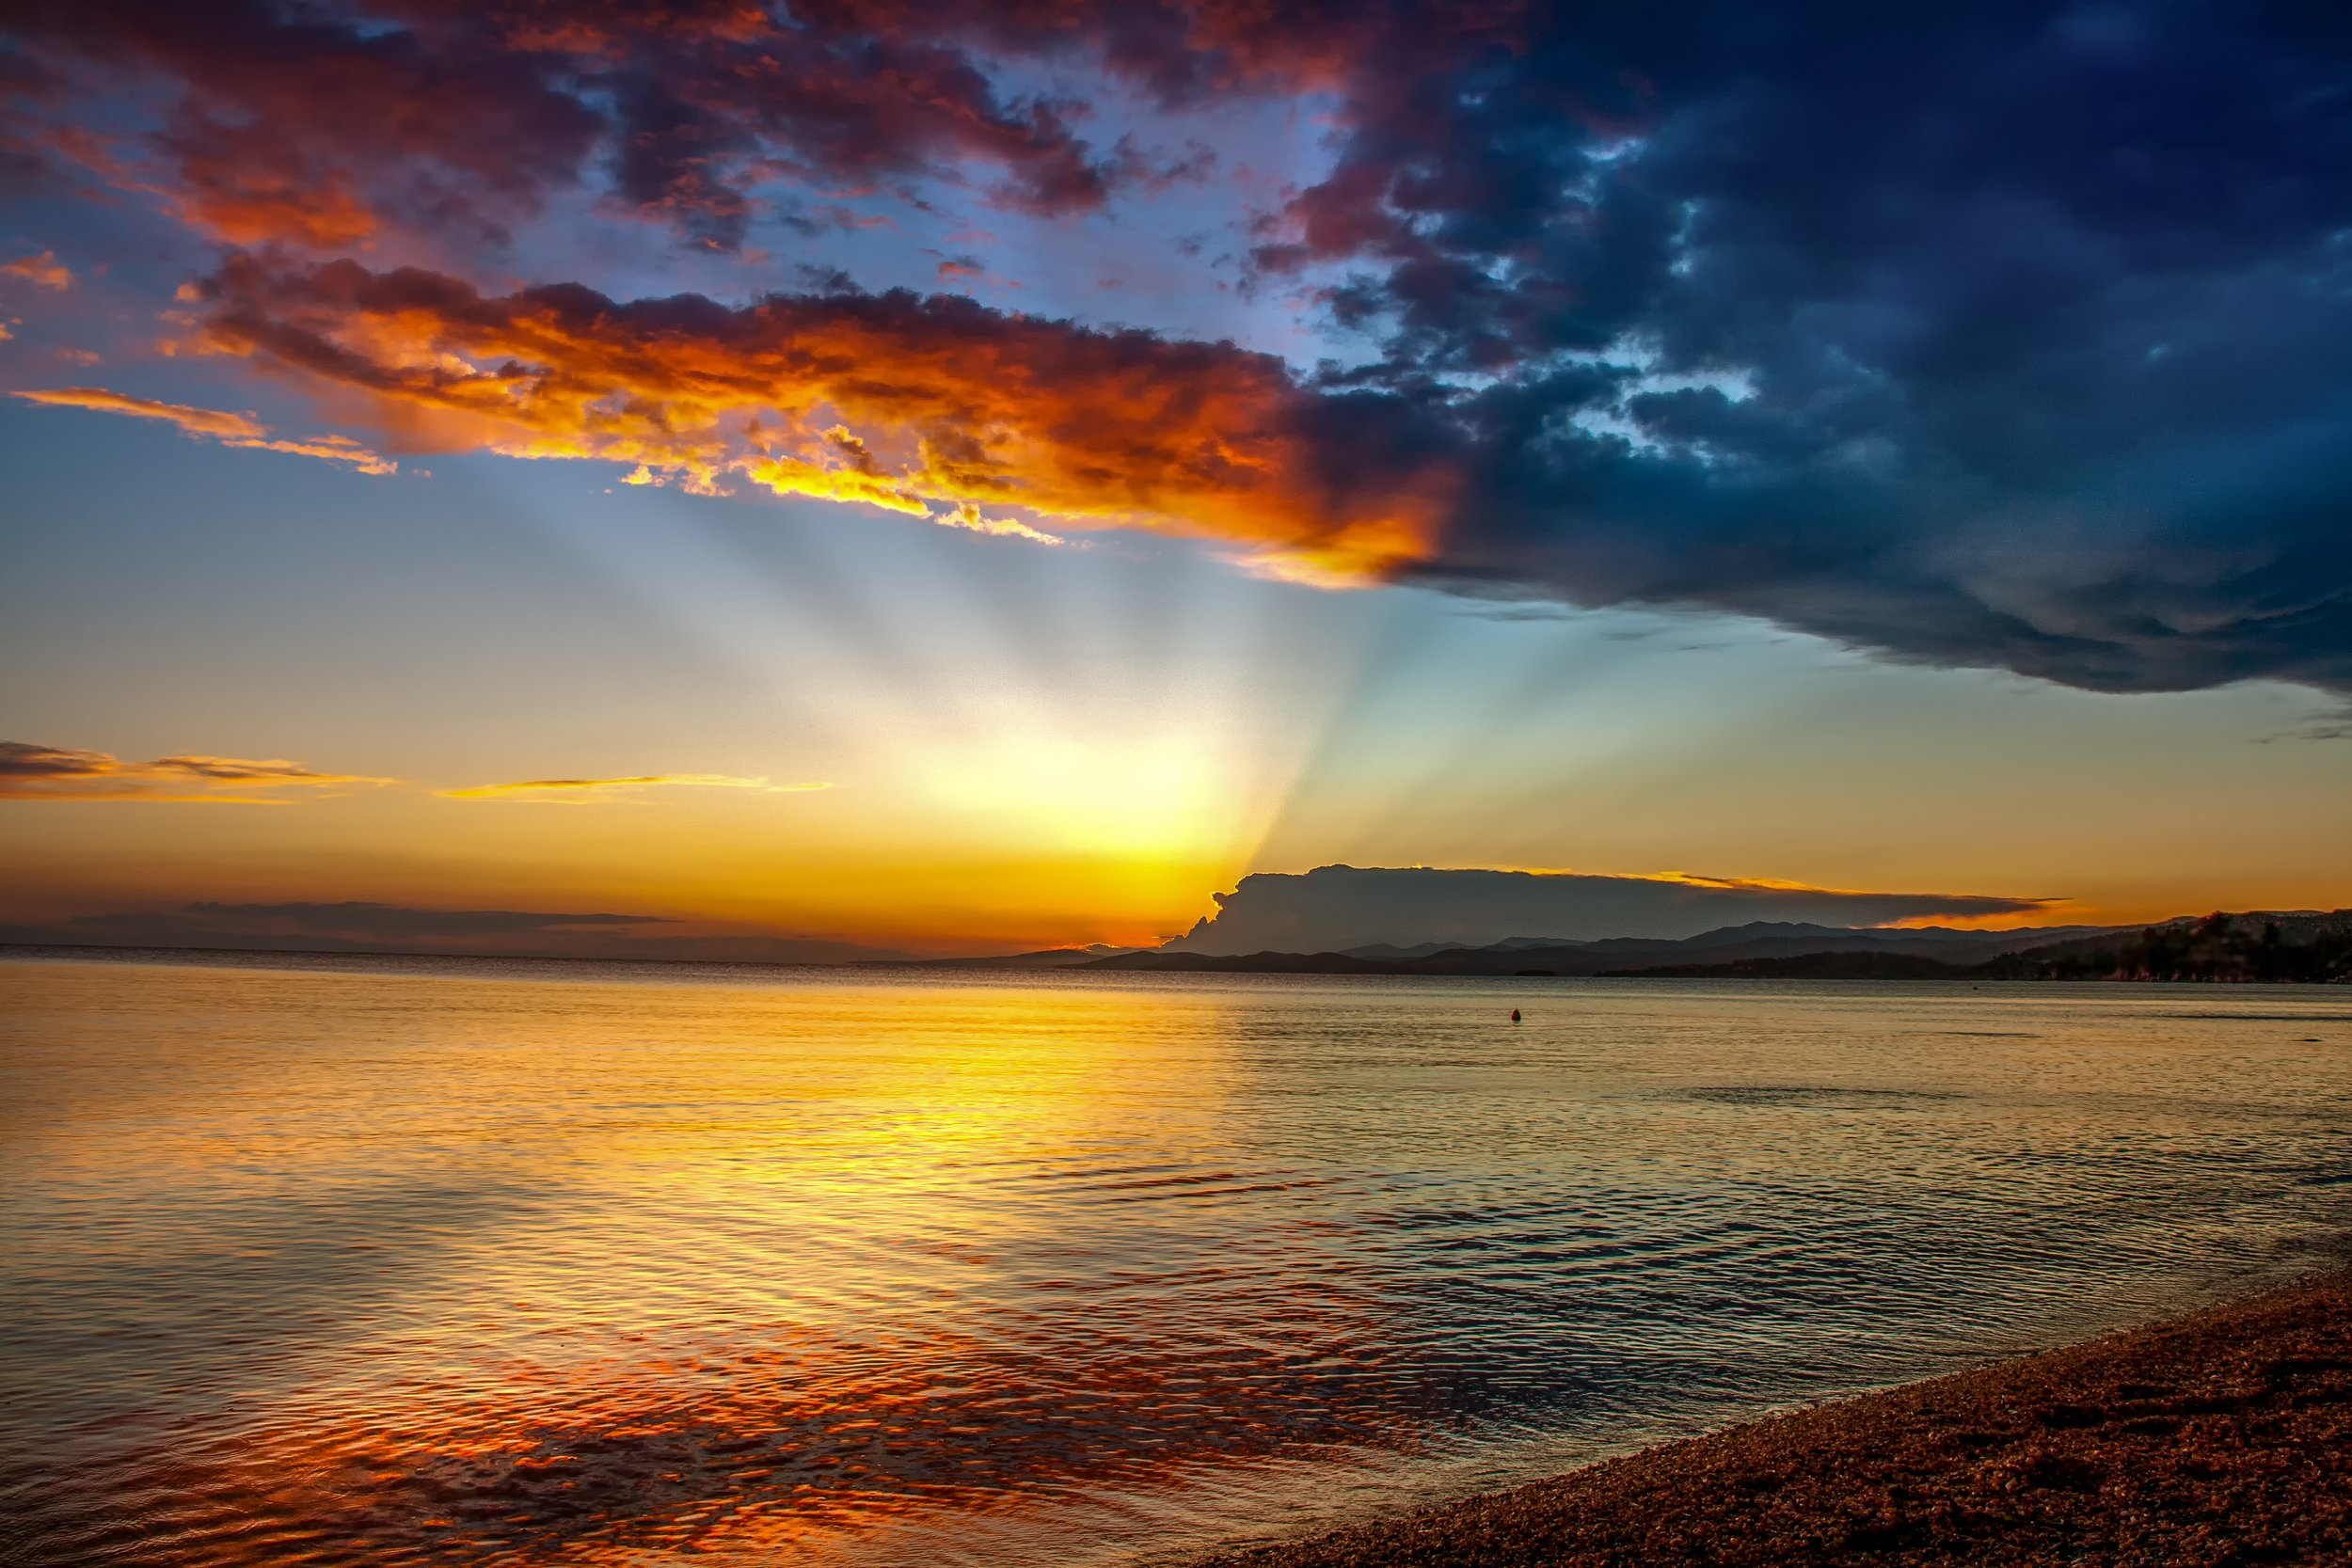 sunset-3797156.jpg